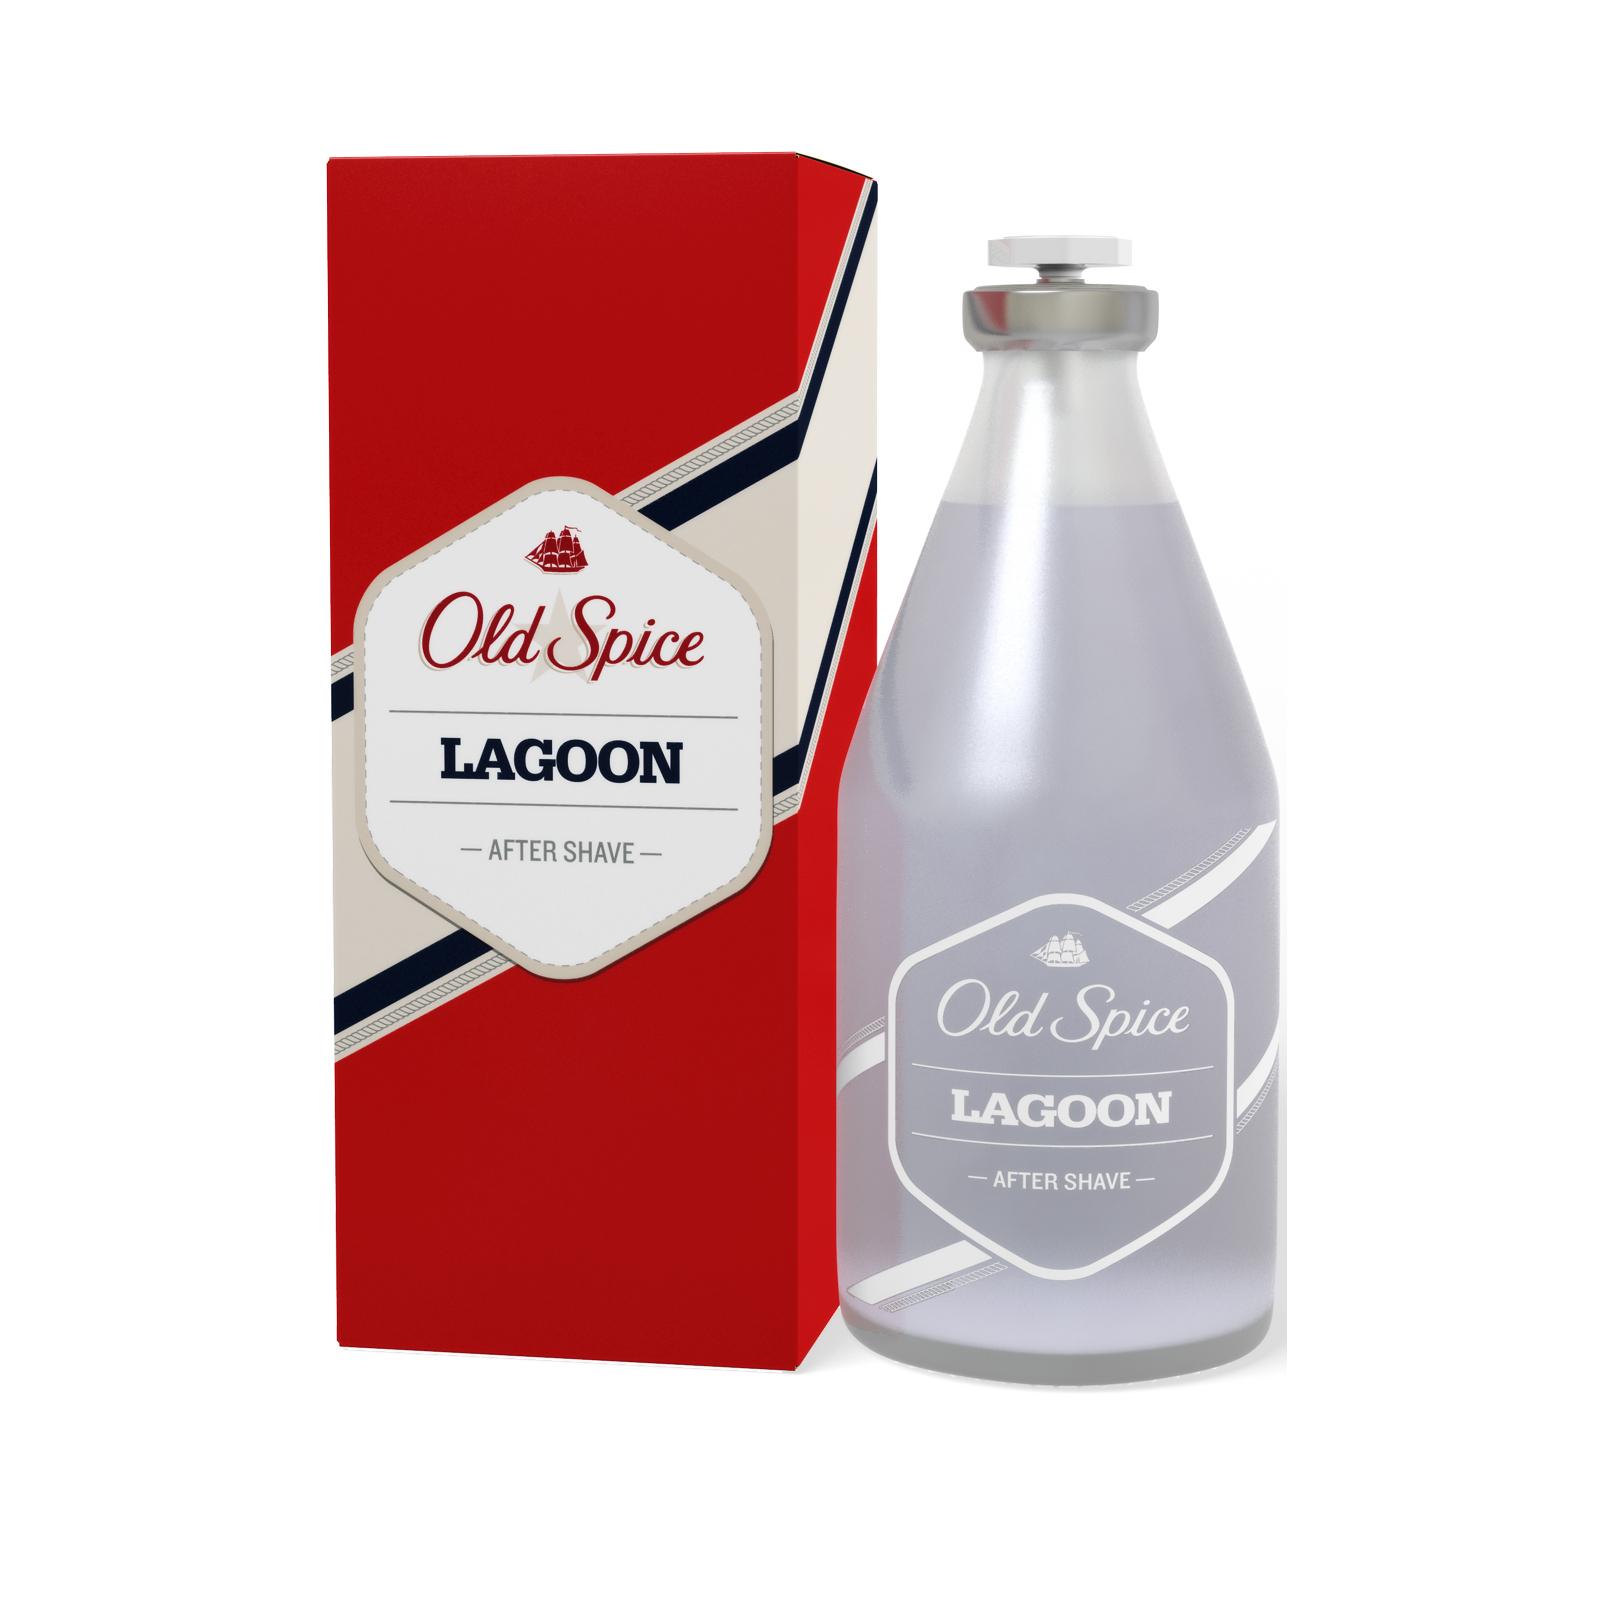 Лосьон после бритья Old Spice Lagoon 100 мл (5000174440287)